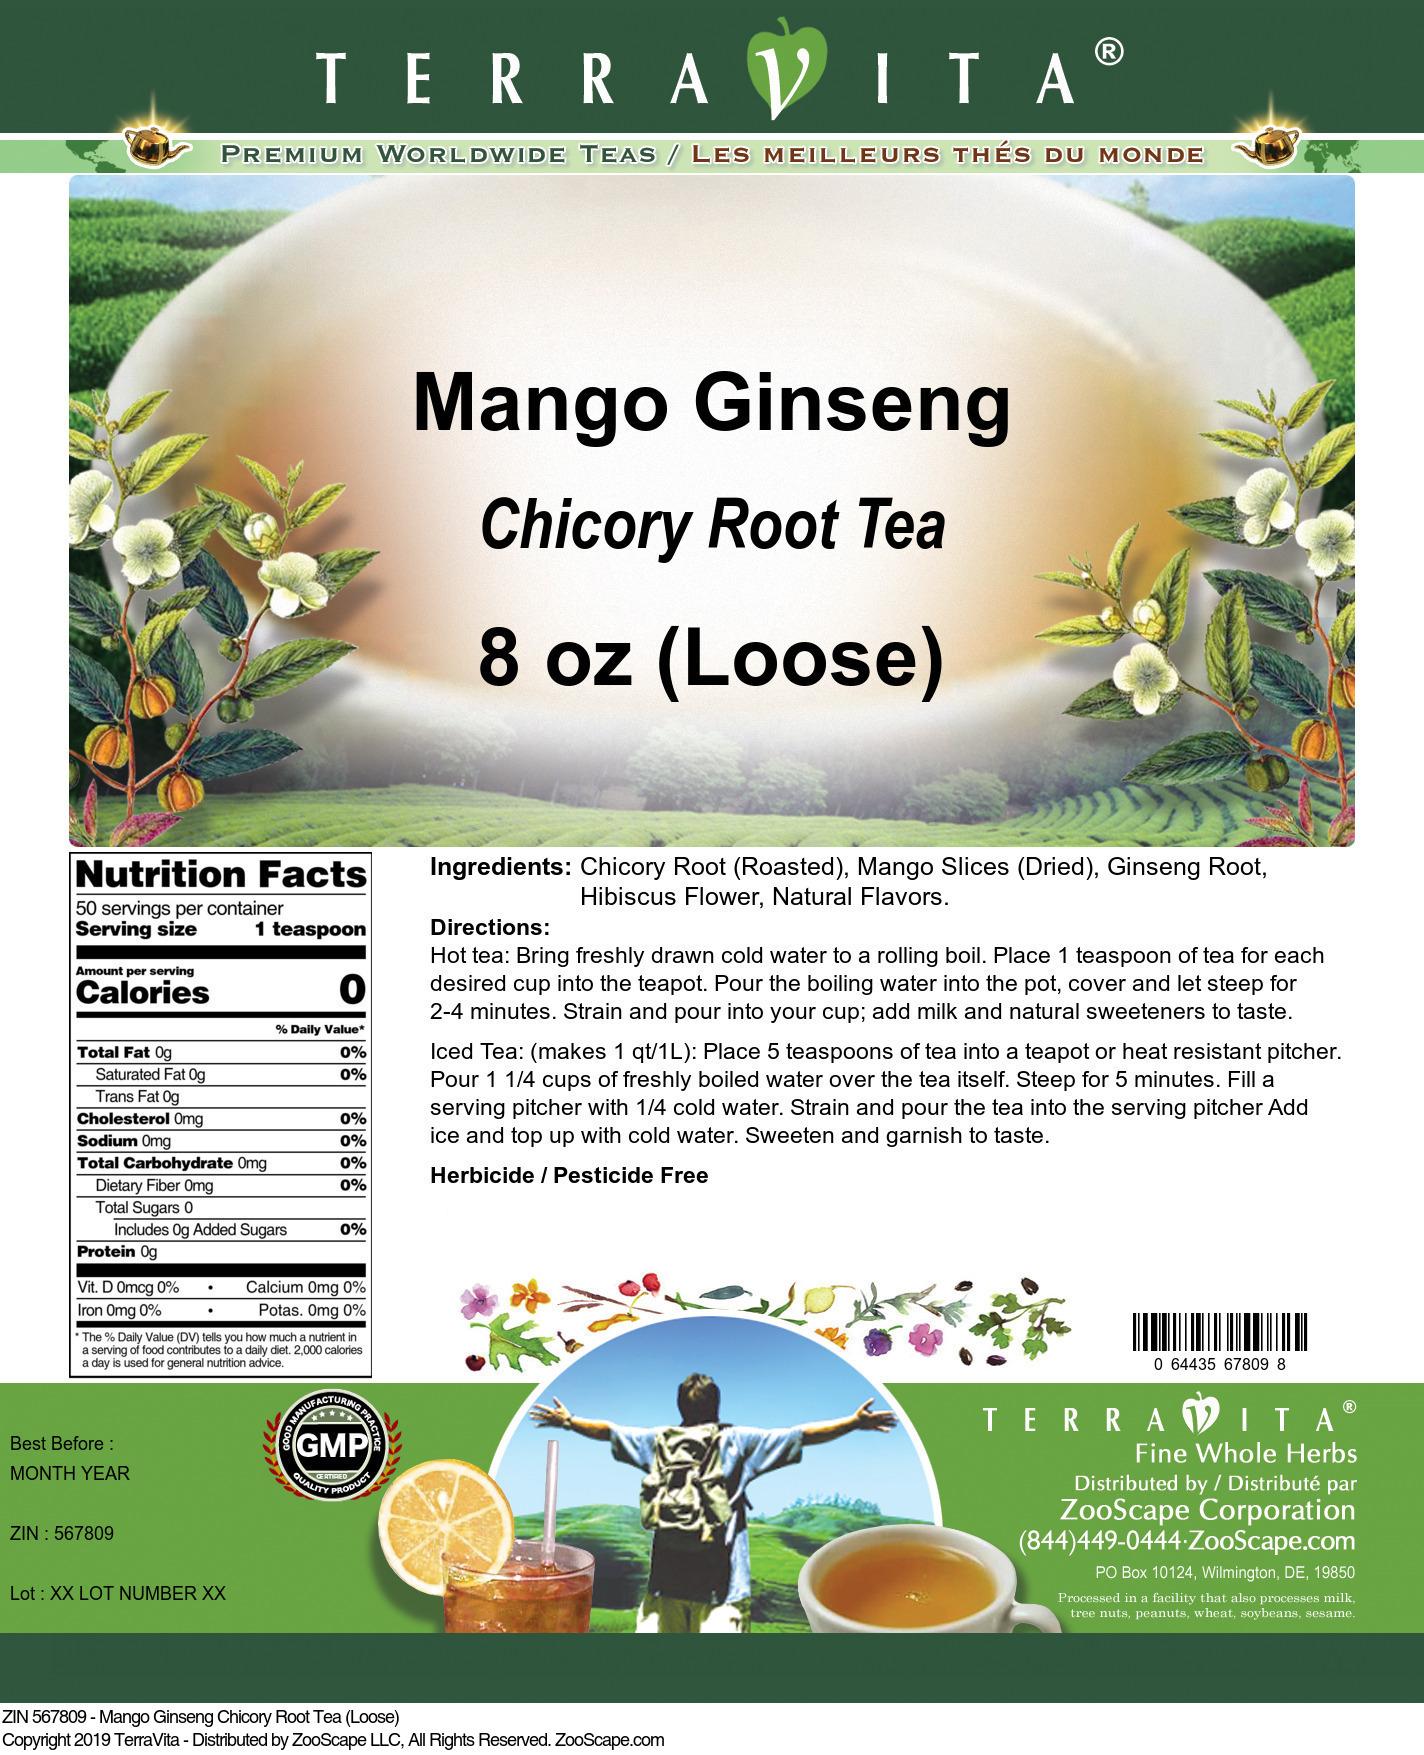 Mango Ginseng Chicory Root Tea (Loose)